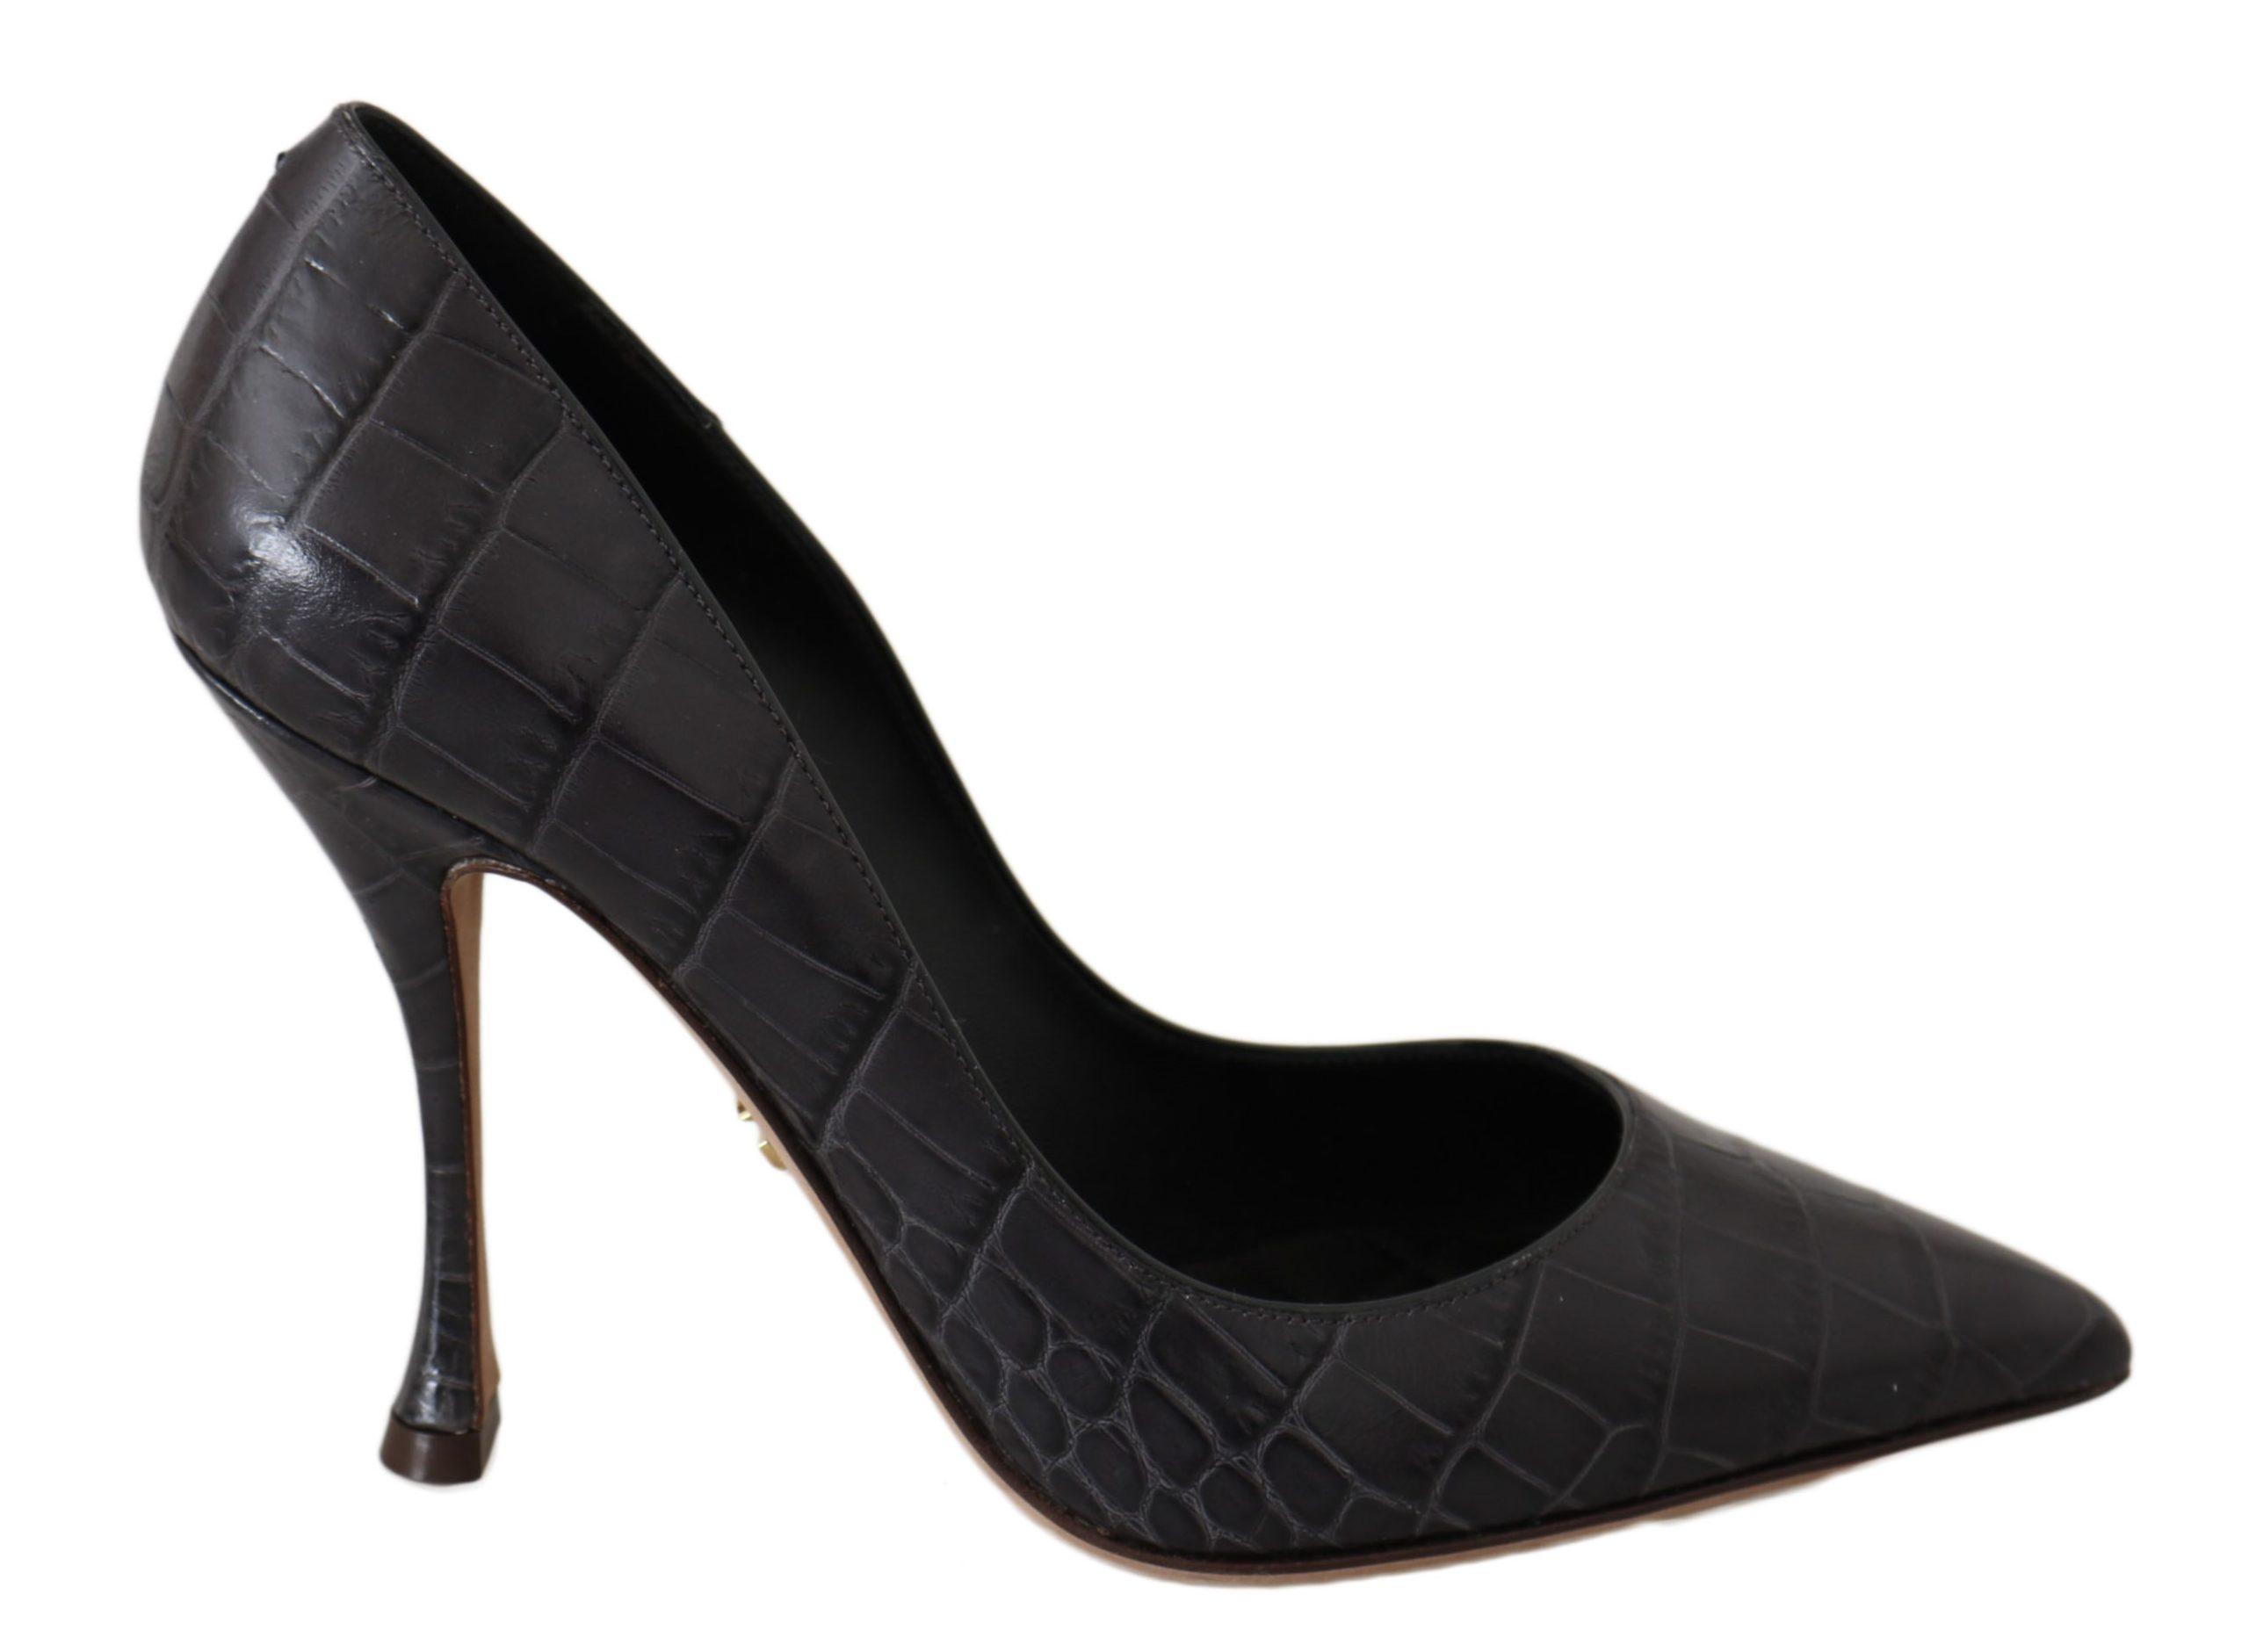 Dolce & Gabbana Women's Leather Heels Pumps Heels Gray LA5984 - EU35/US4.5